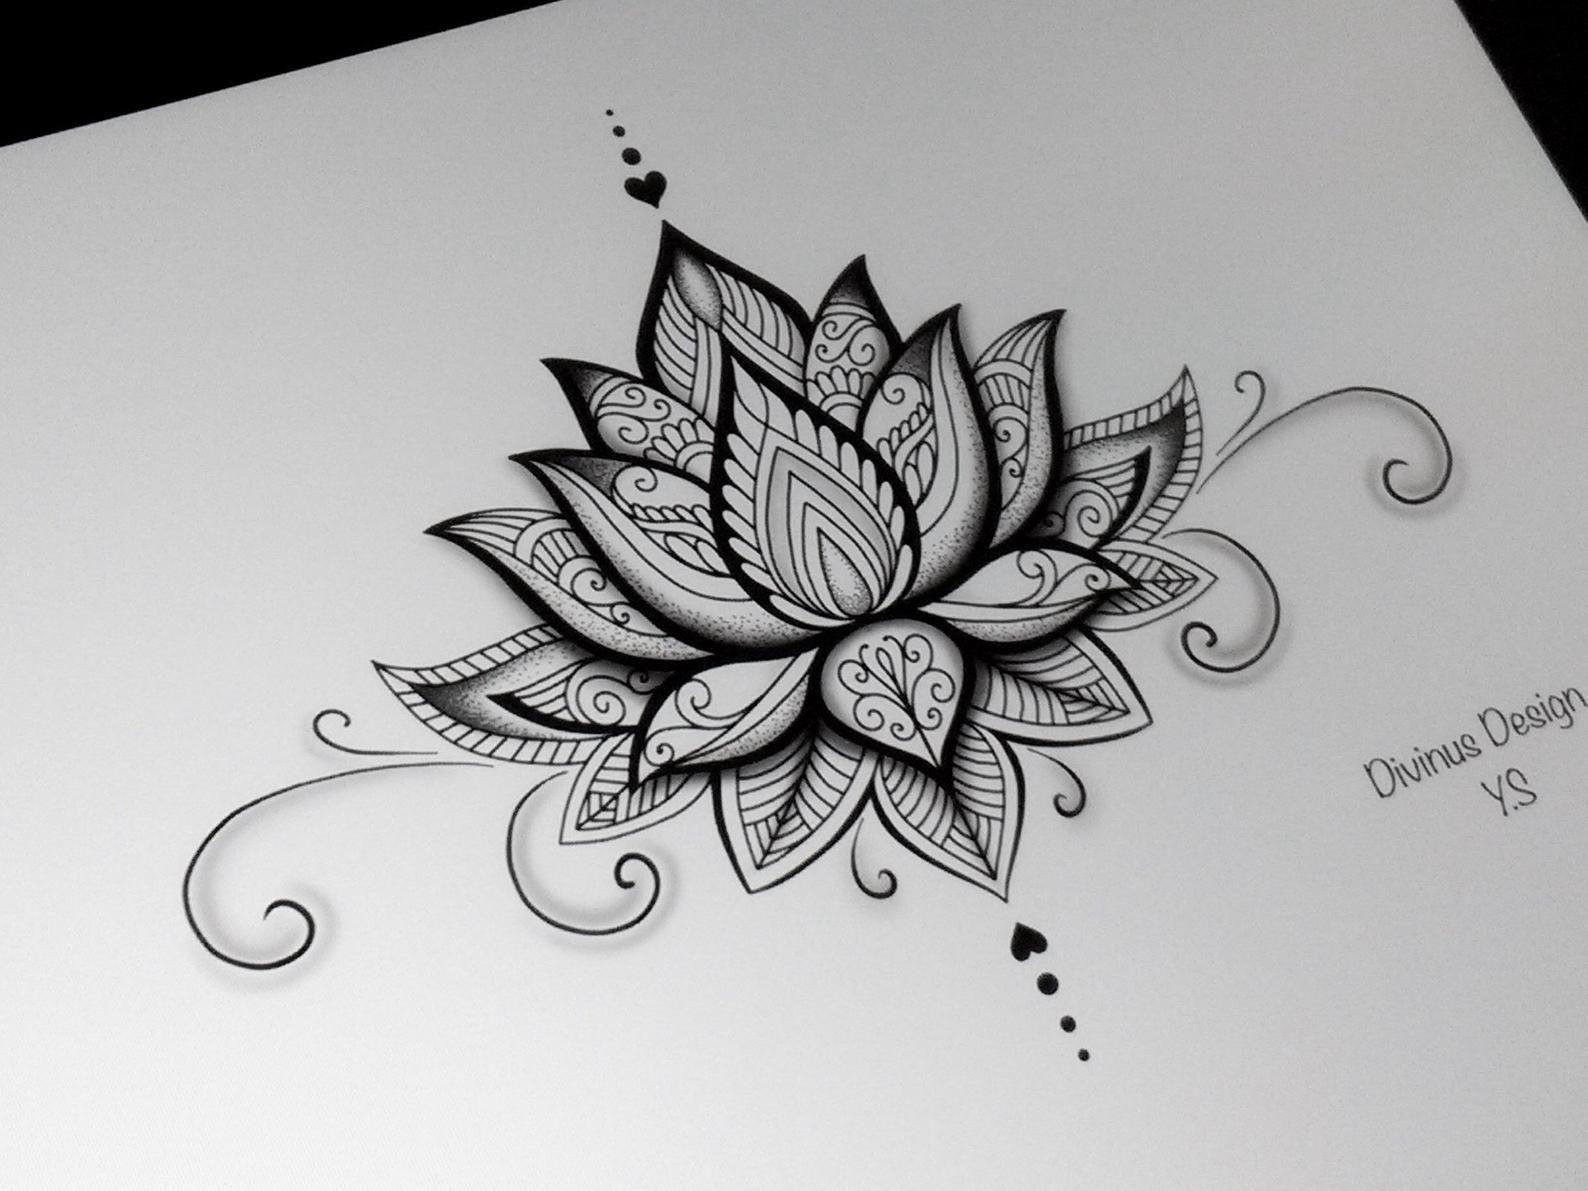 Lotus Mandala Tattoo Design and Stencil/Template - Instant Digital Download